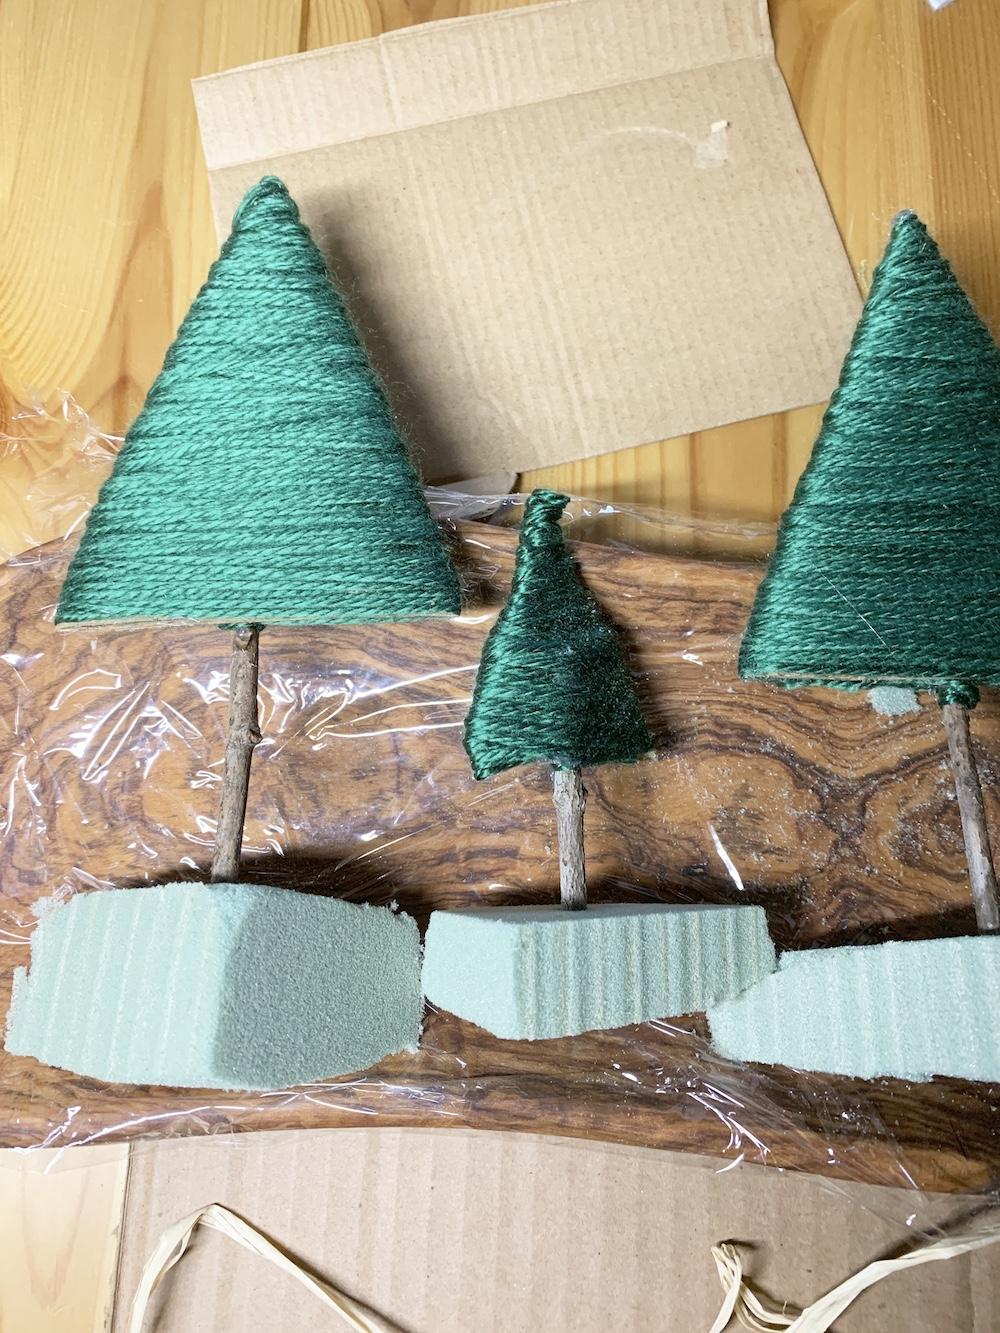 DIY Decor Trees on Florist Dry Foam #DIY #DIYChristmasCenterpiece #ChristmasDecor #ChristmasTableTop #DIYChristmasProject #RusticDecor #ChristmasCenterpiece